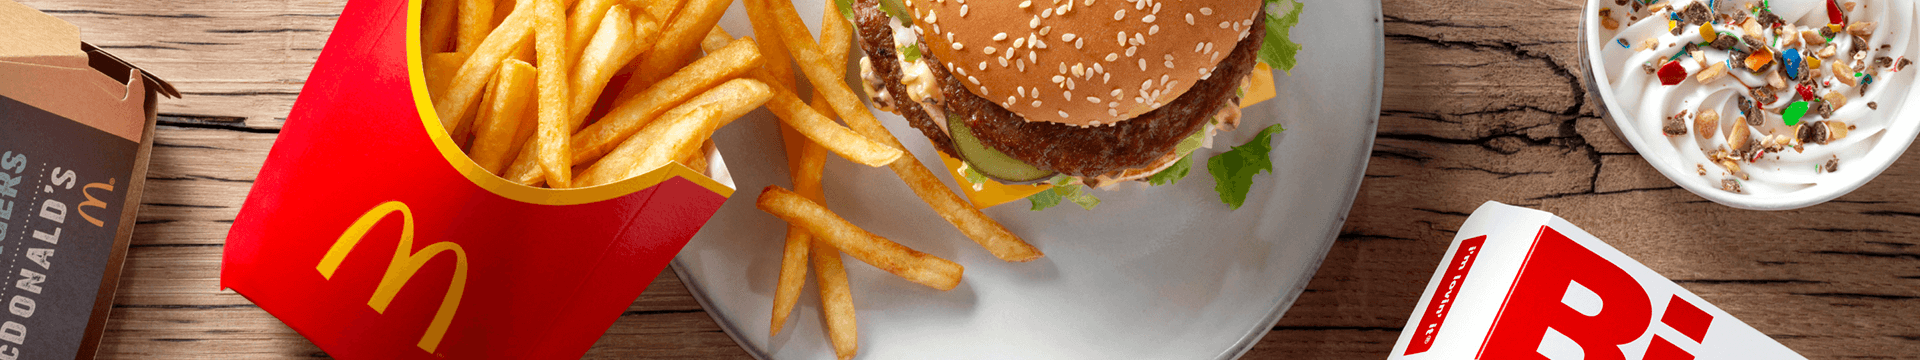 McDonald's® Thuisbezorgd